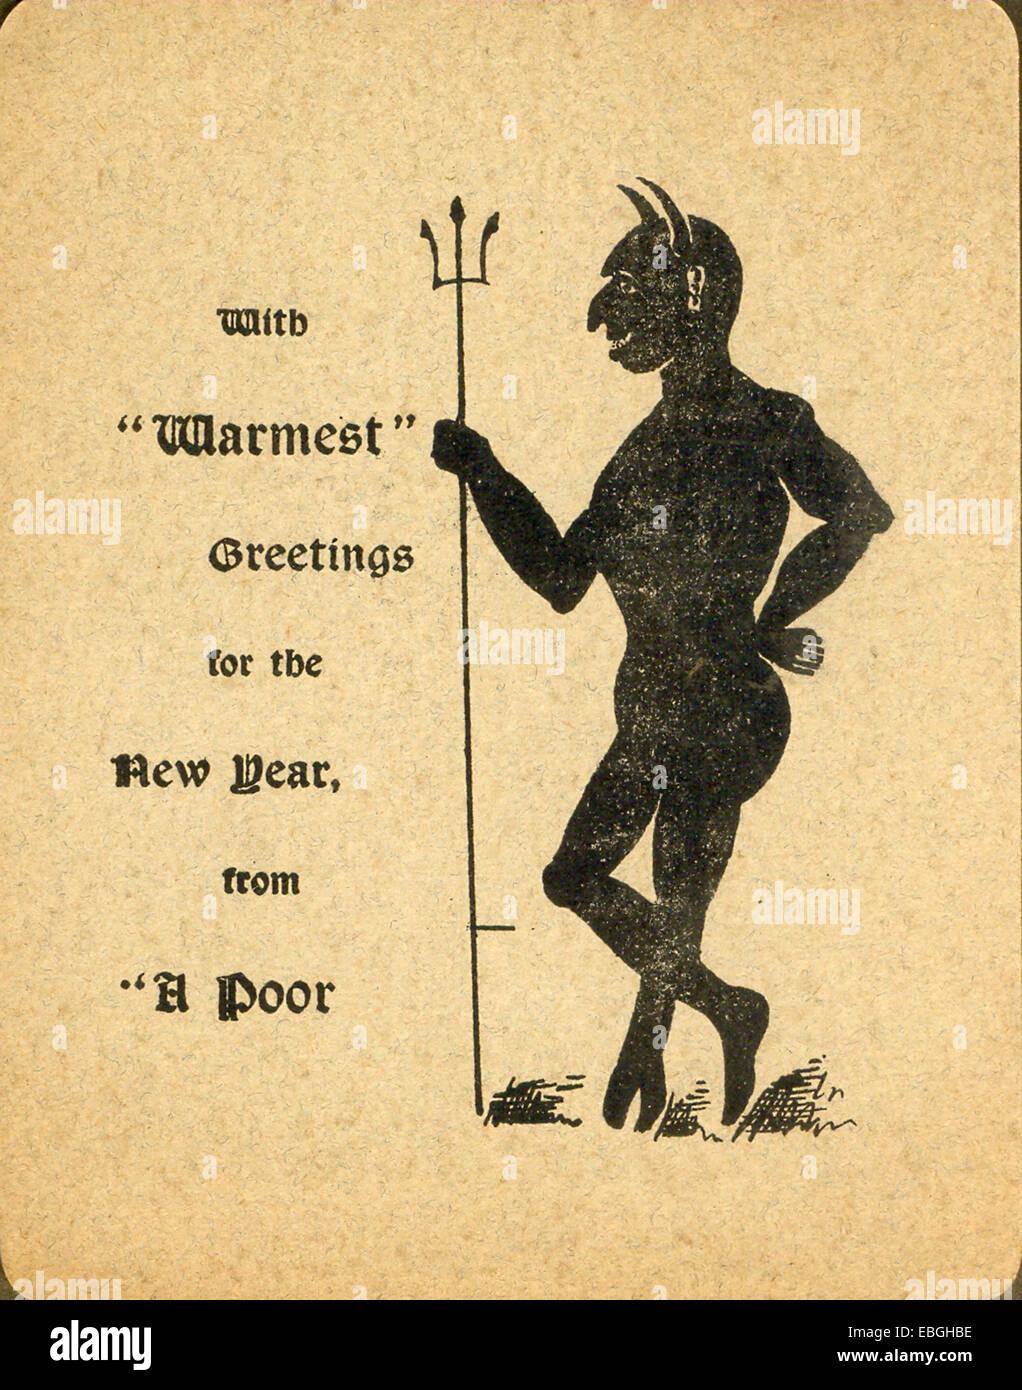 Victorian humorous greeting card - Stock Image